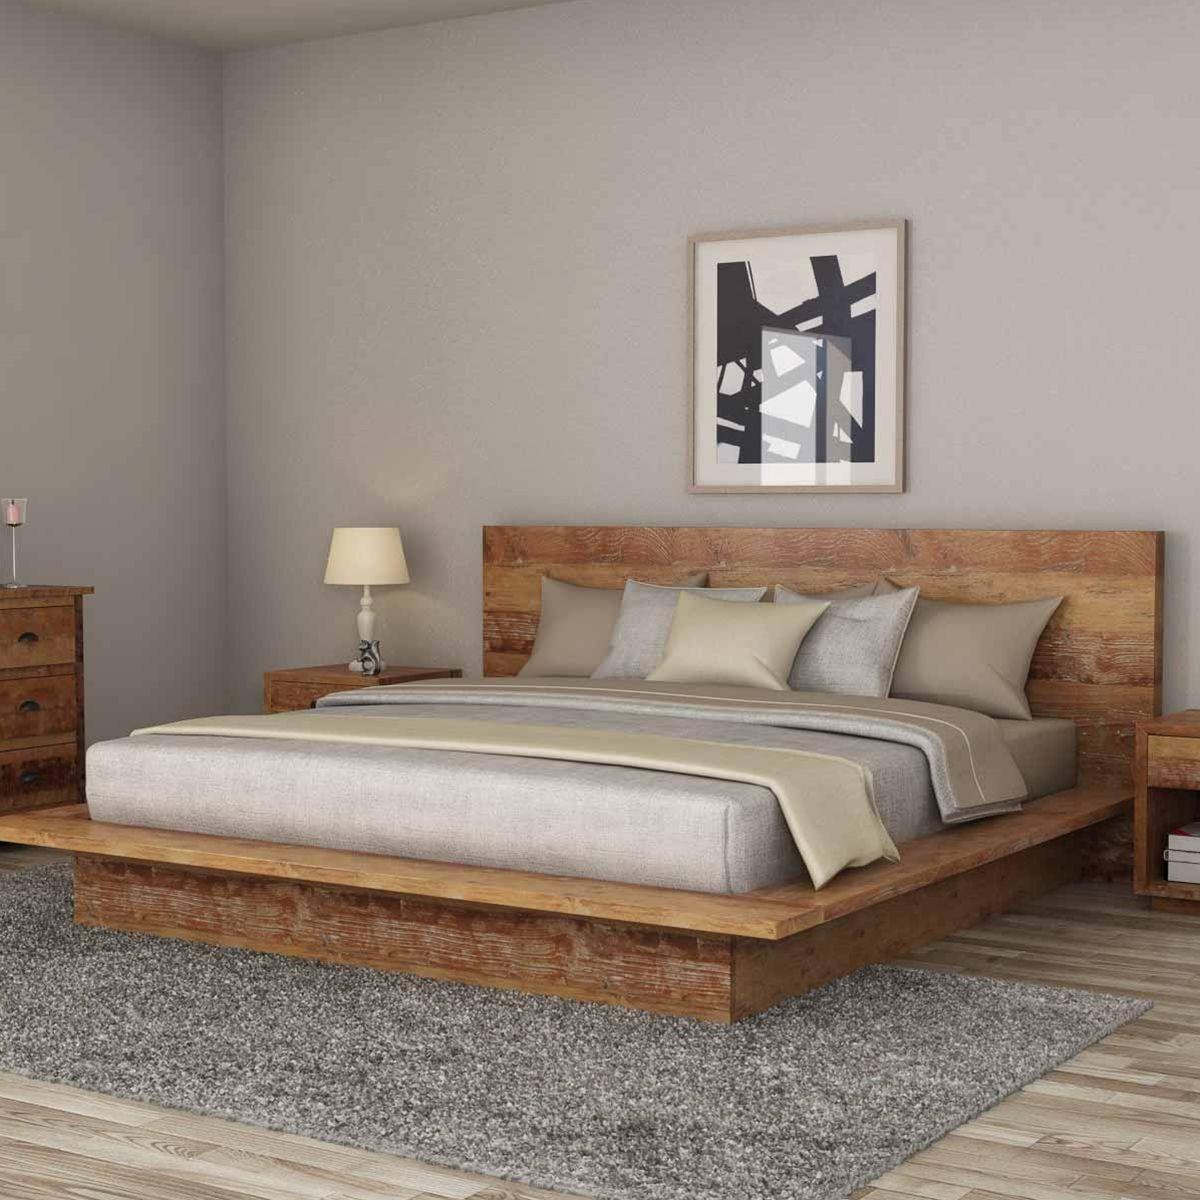 britain rustic teak wood platform bed